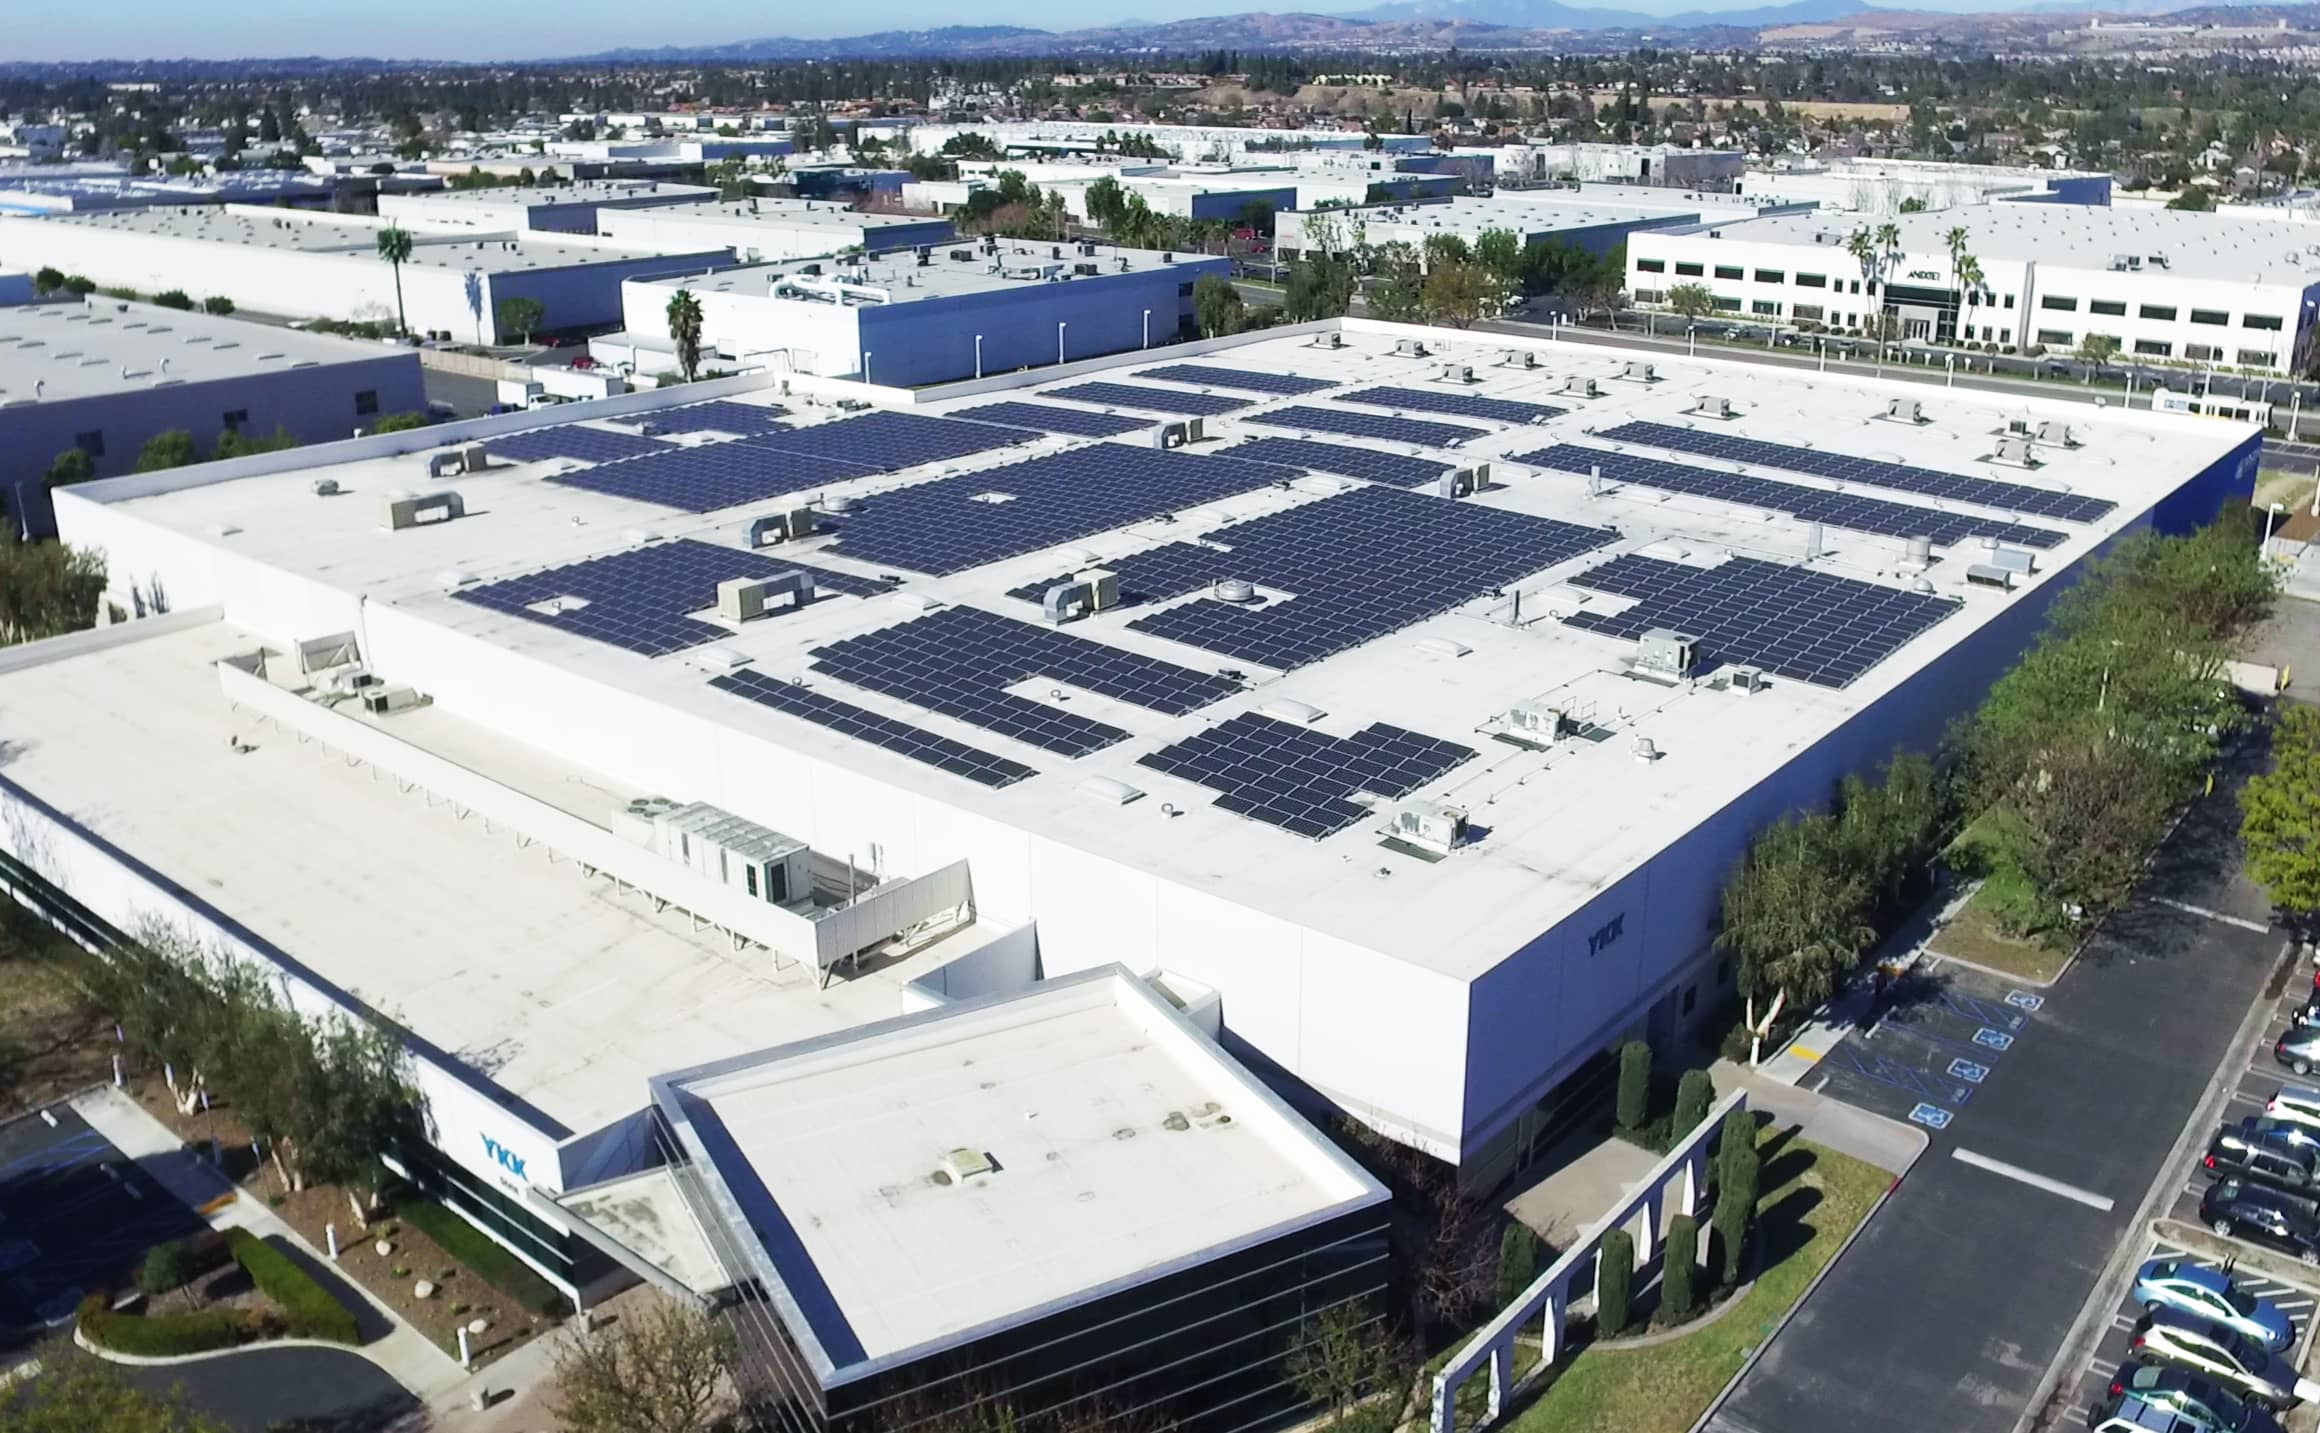 zipper manufacturer adds solar to anaheim facility solar. Black Bedroom Furniture Sets. Home Design Ideas